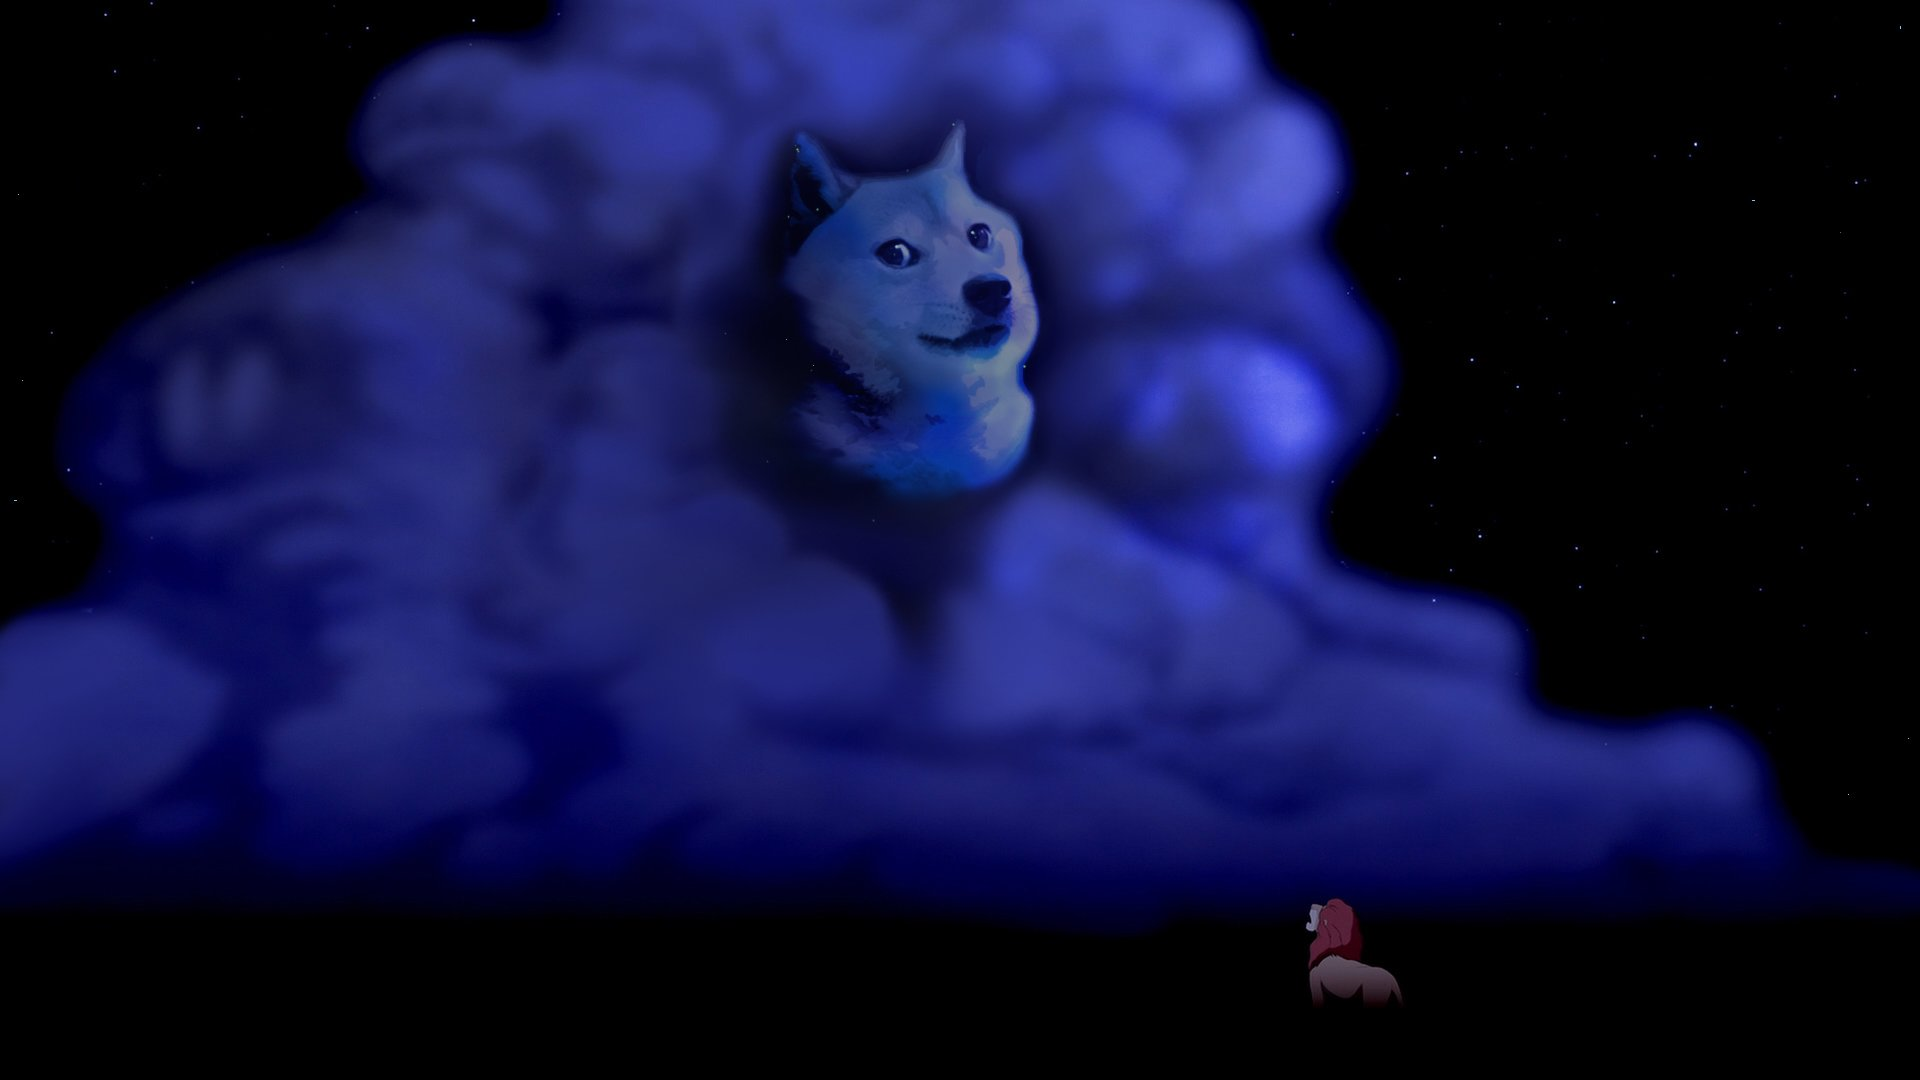 Night Doge Meme Dog disney wolf wolves fantasy wallpaper background 1920x1080